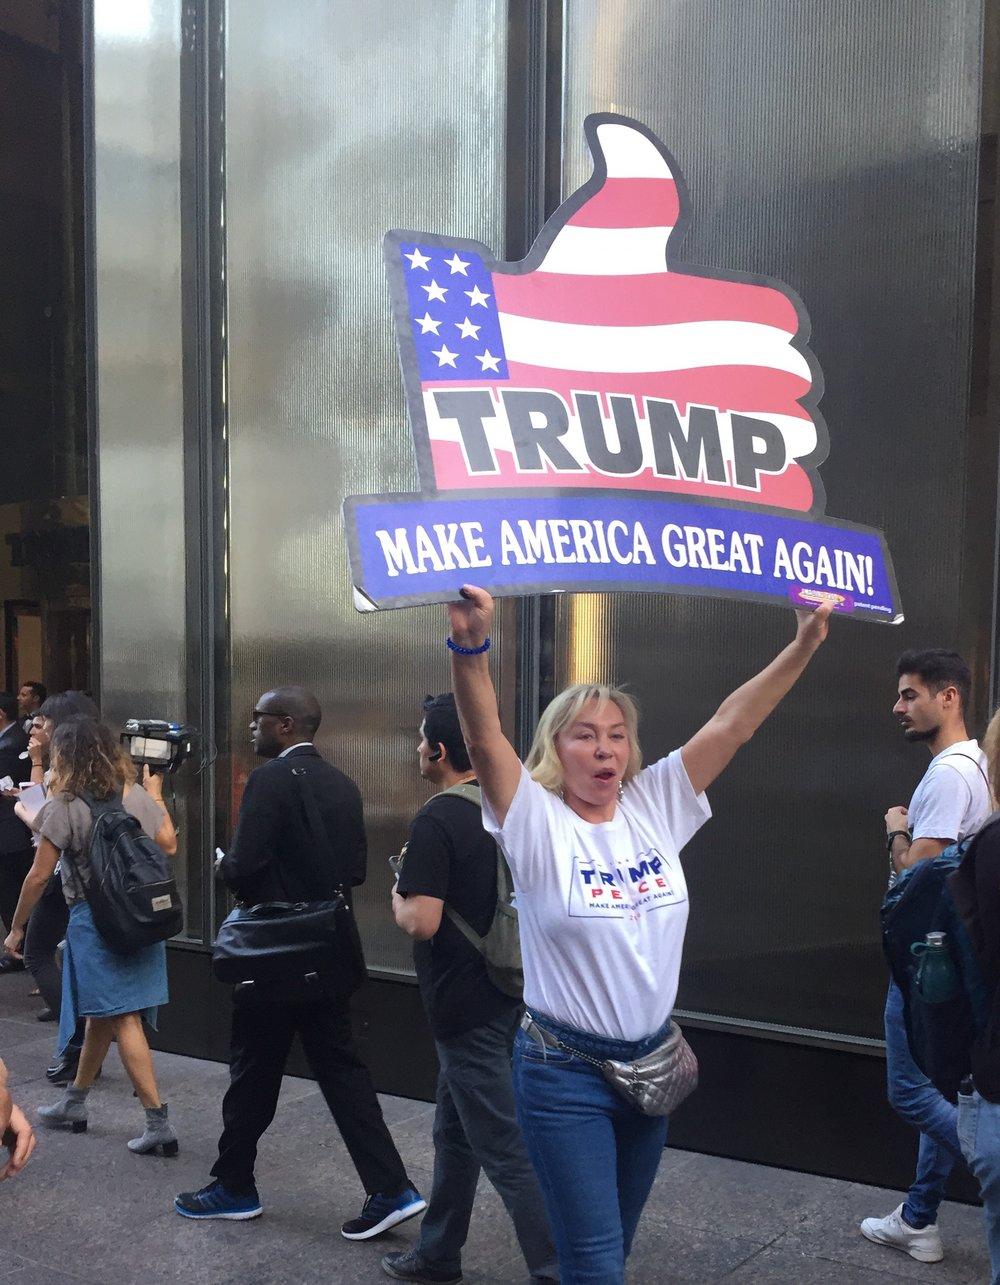 'Guys Talk Like That:' Pro-Trump Women Defend 'Gentleman' Candidate - DNAinfo